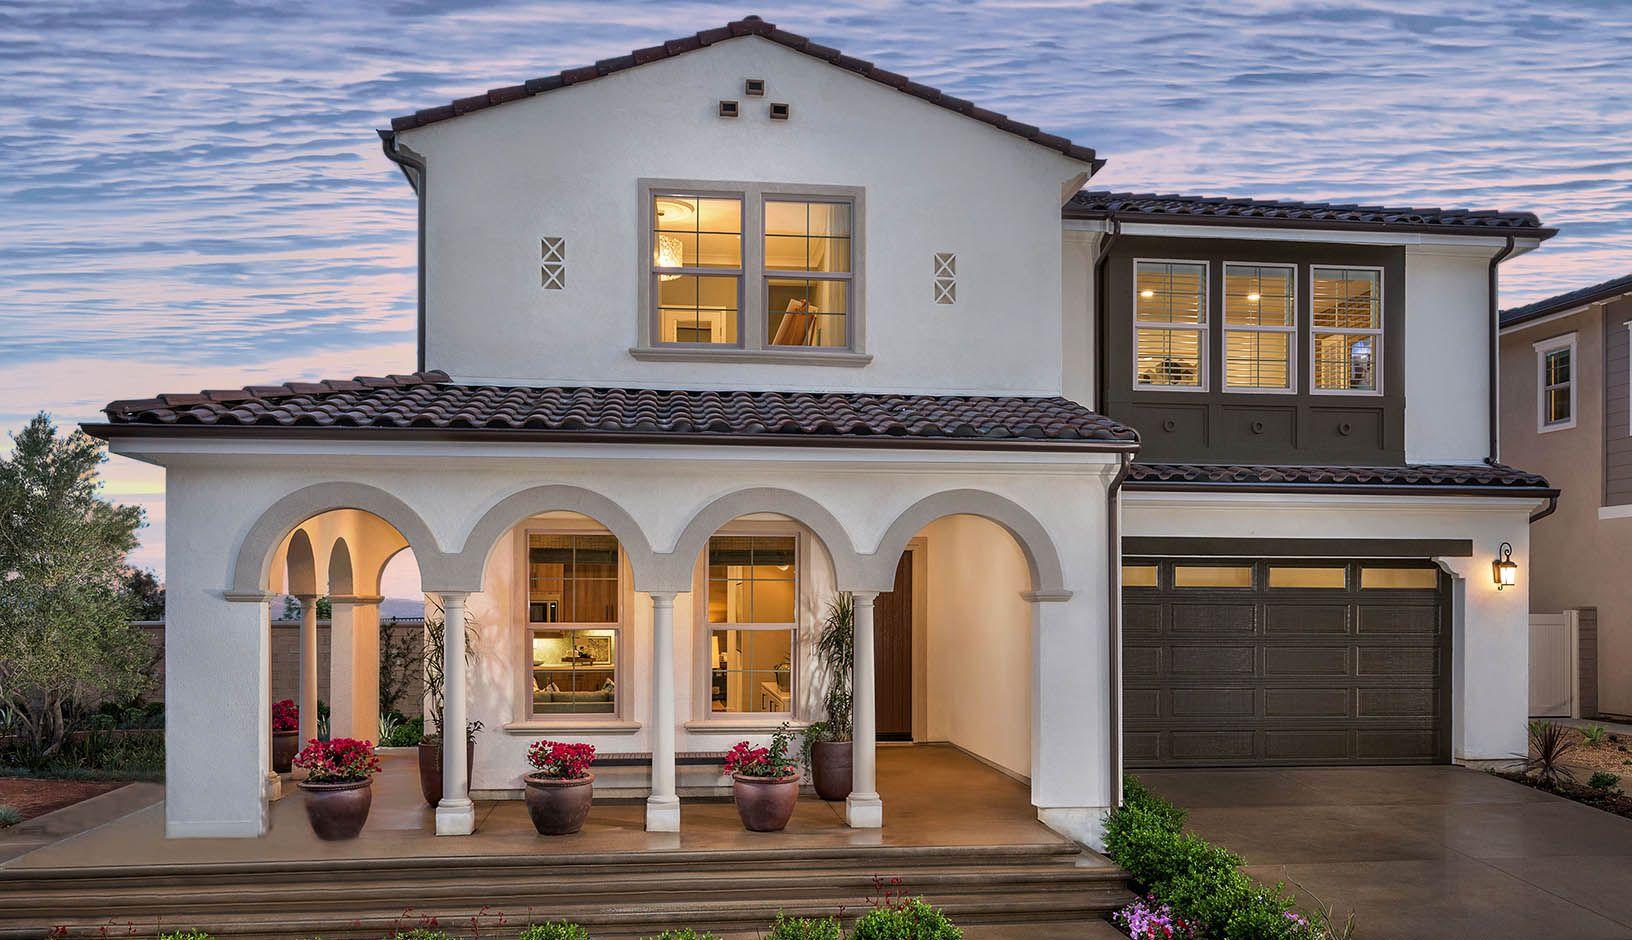 Singola Famiglia per Vendita alle ore Bradford At Rosedale - Residence 3 742 East Orange Blossom Way Azusa, California 91702 United States